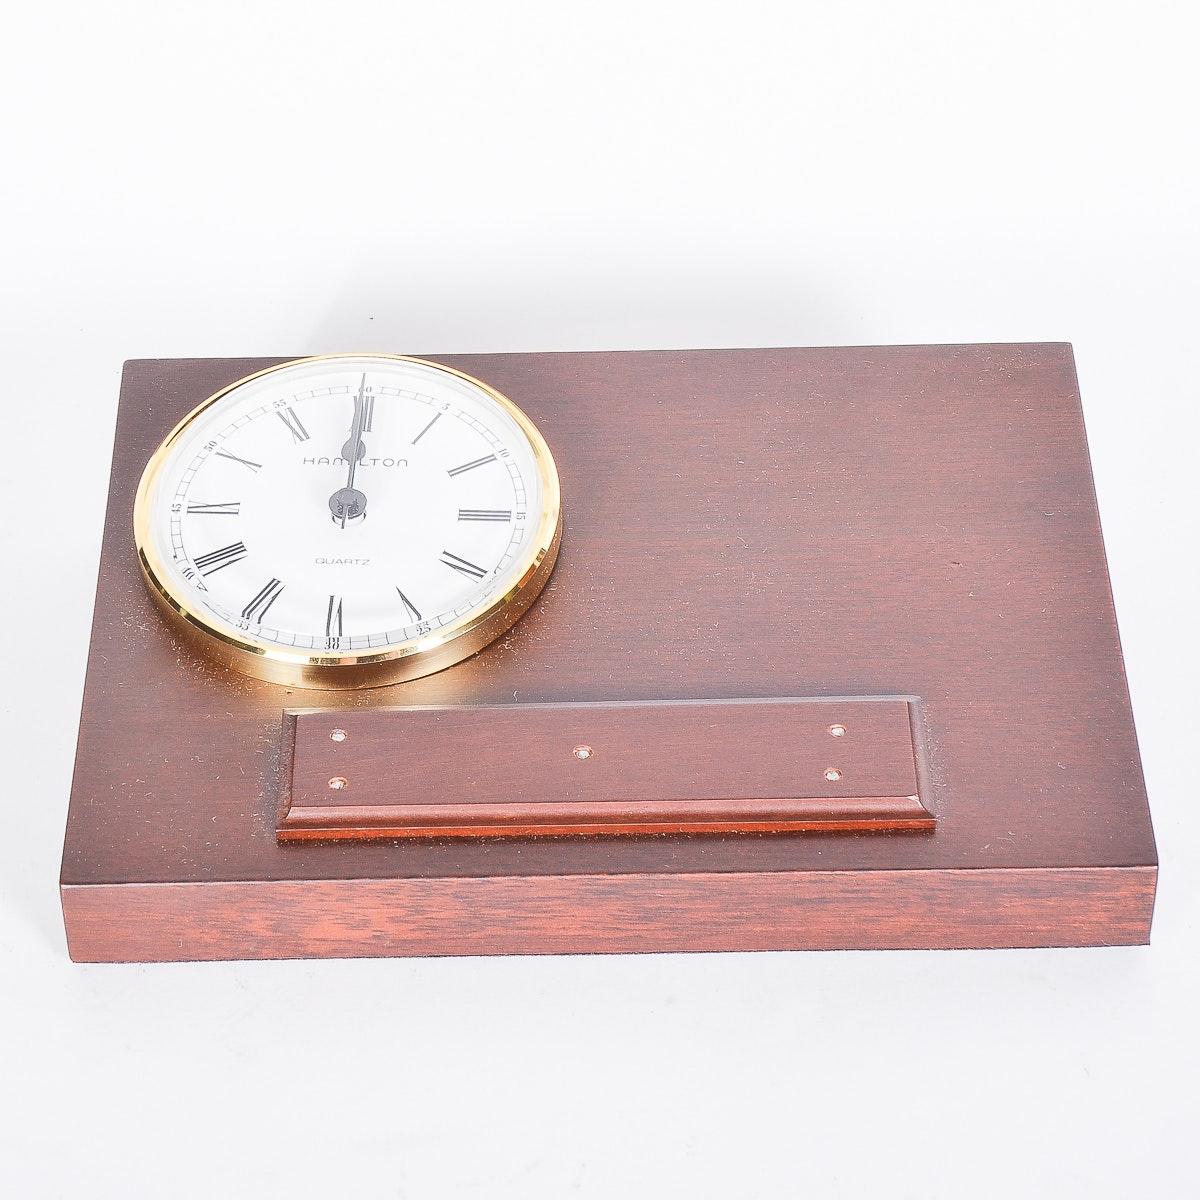 Hamilton Desk Clock